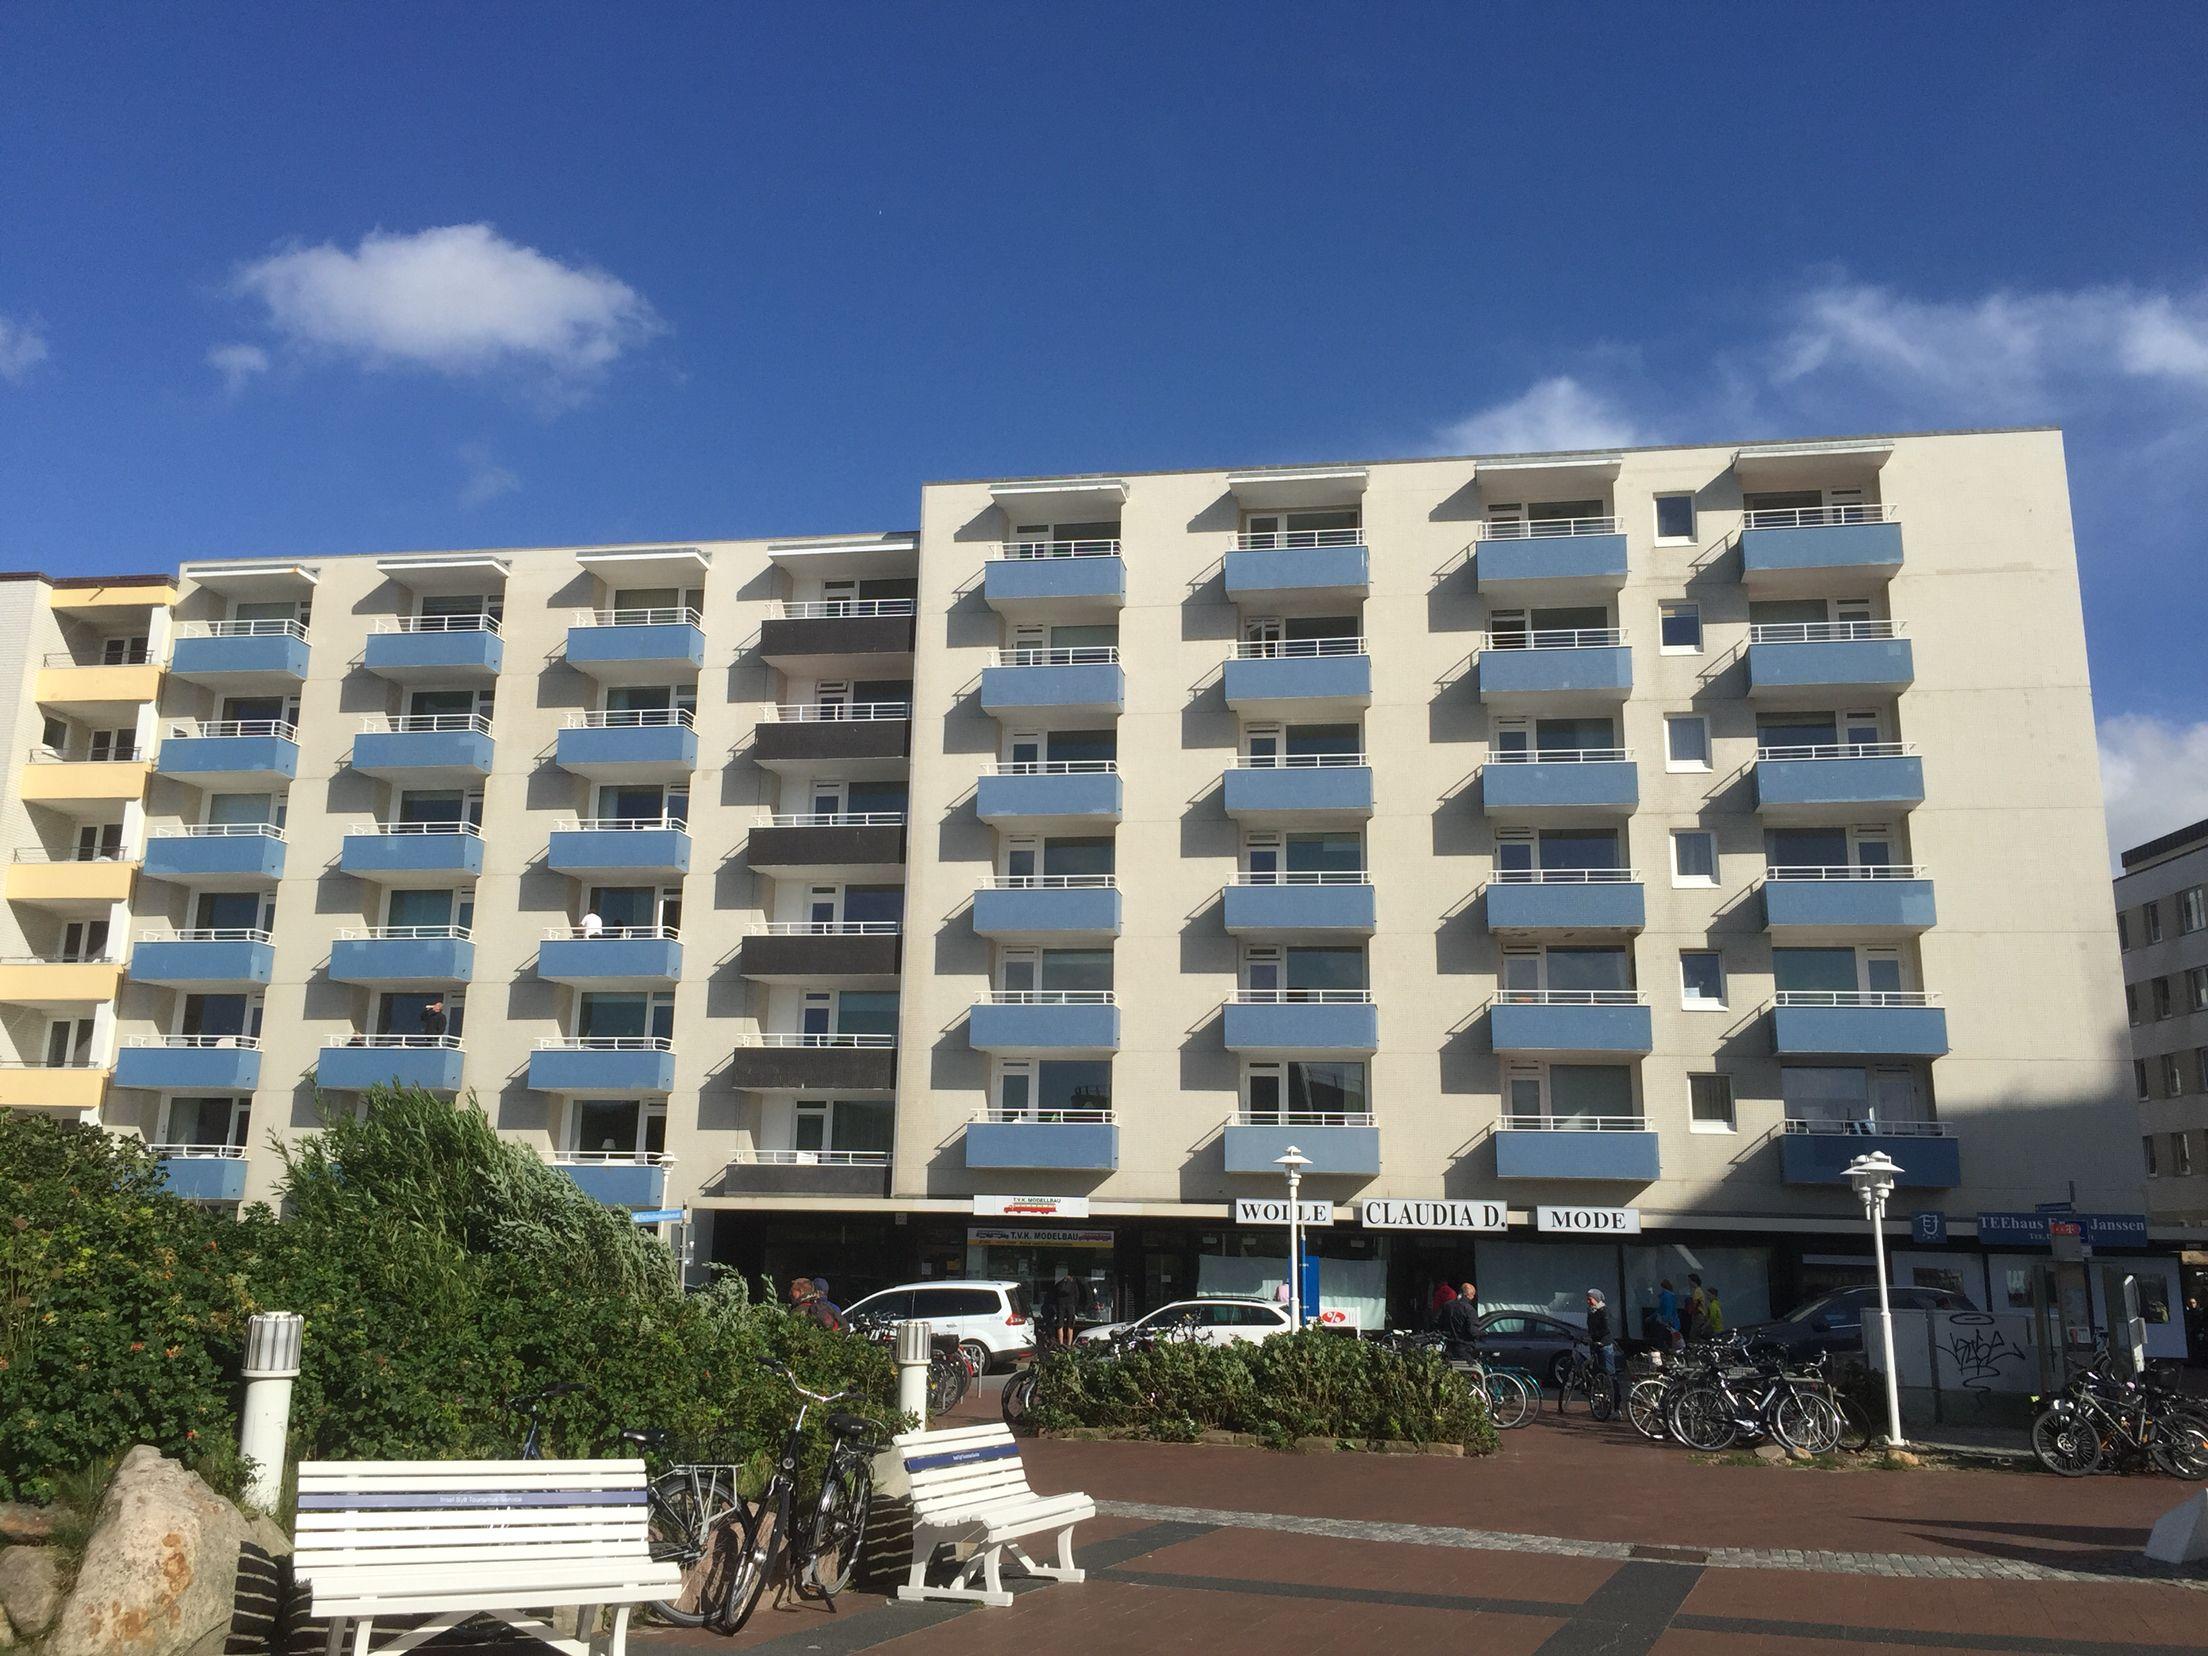 #Westerland #Sylt #Pattenbau